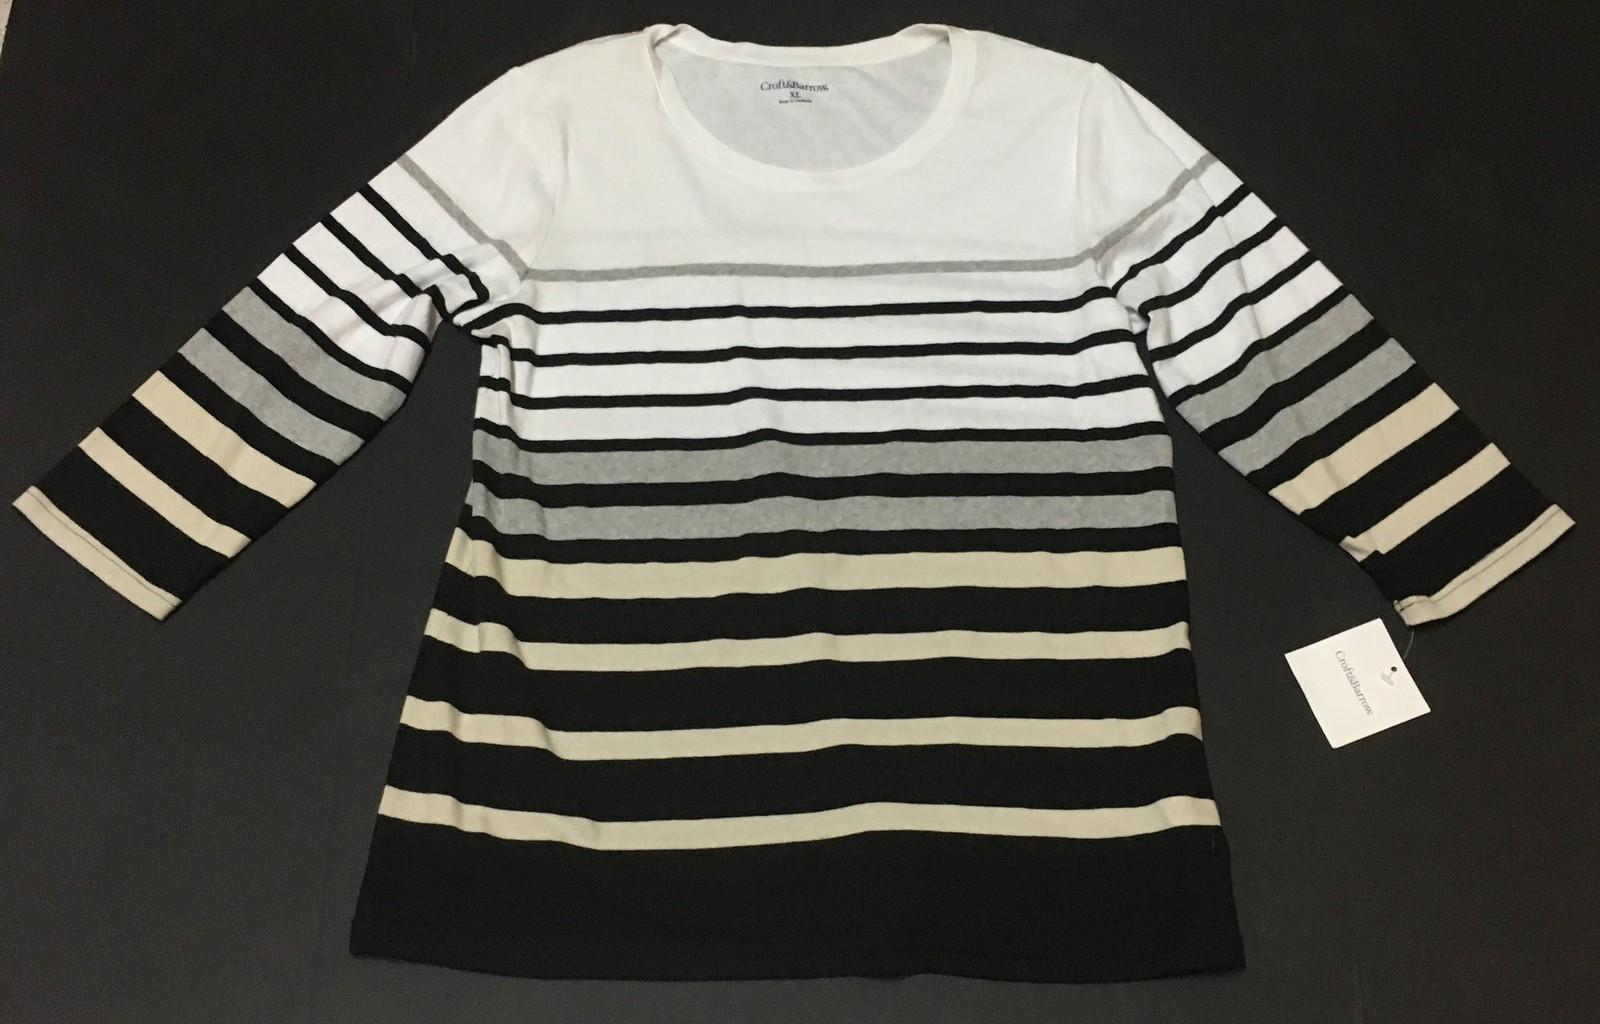 Croft & Barrow Women's Striped Blouse Top Shirt Sz XL